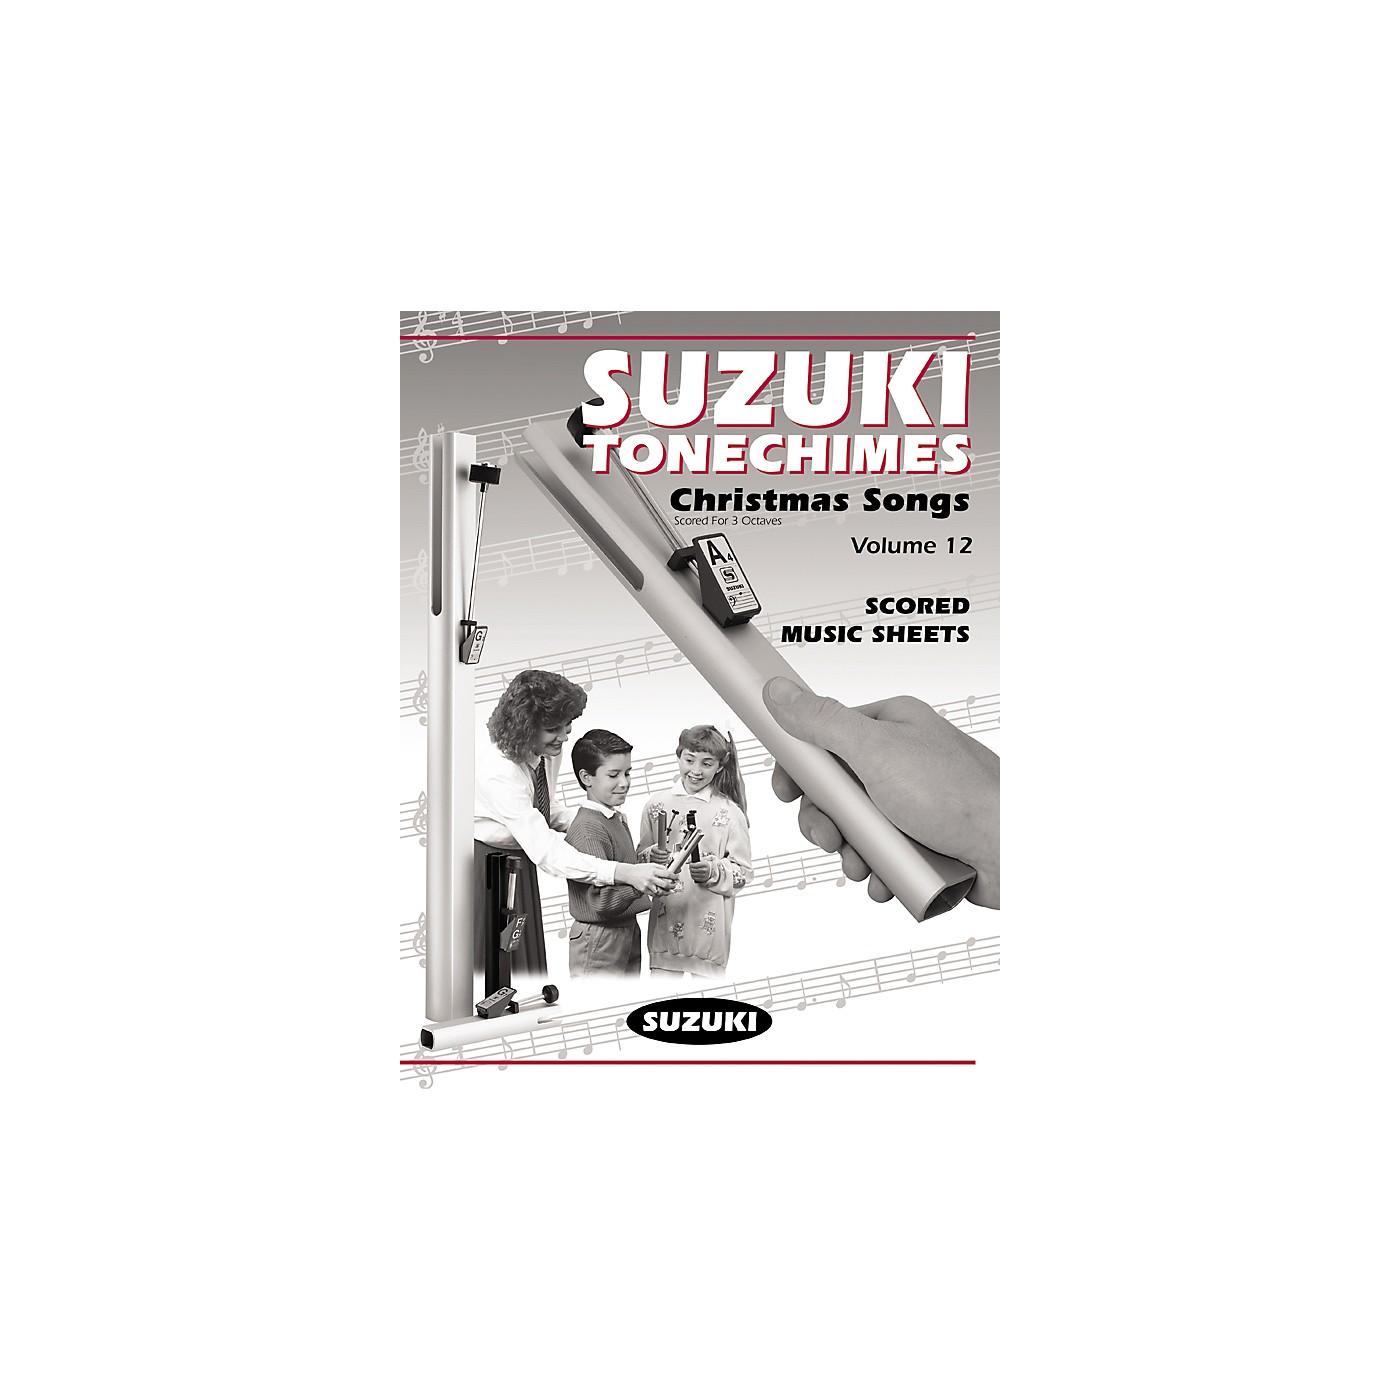 Suzuki Tonechime Arrangements 12 for Handbells Book thumbnail